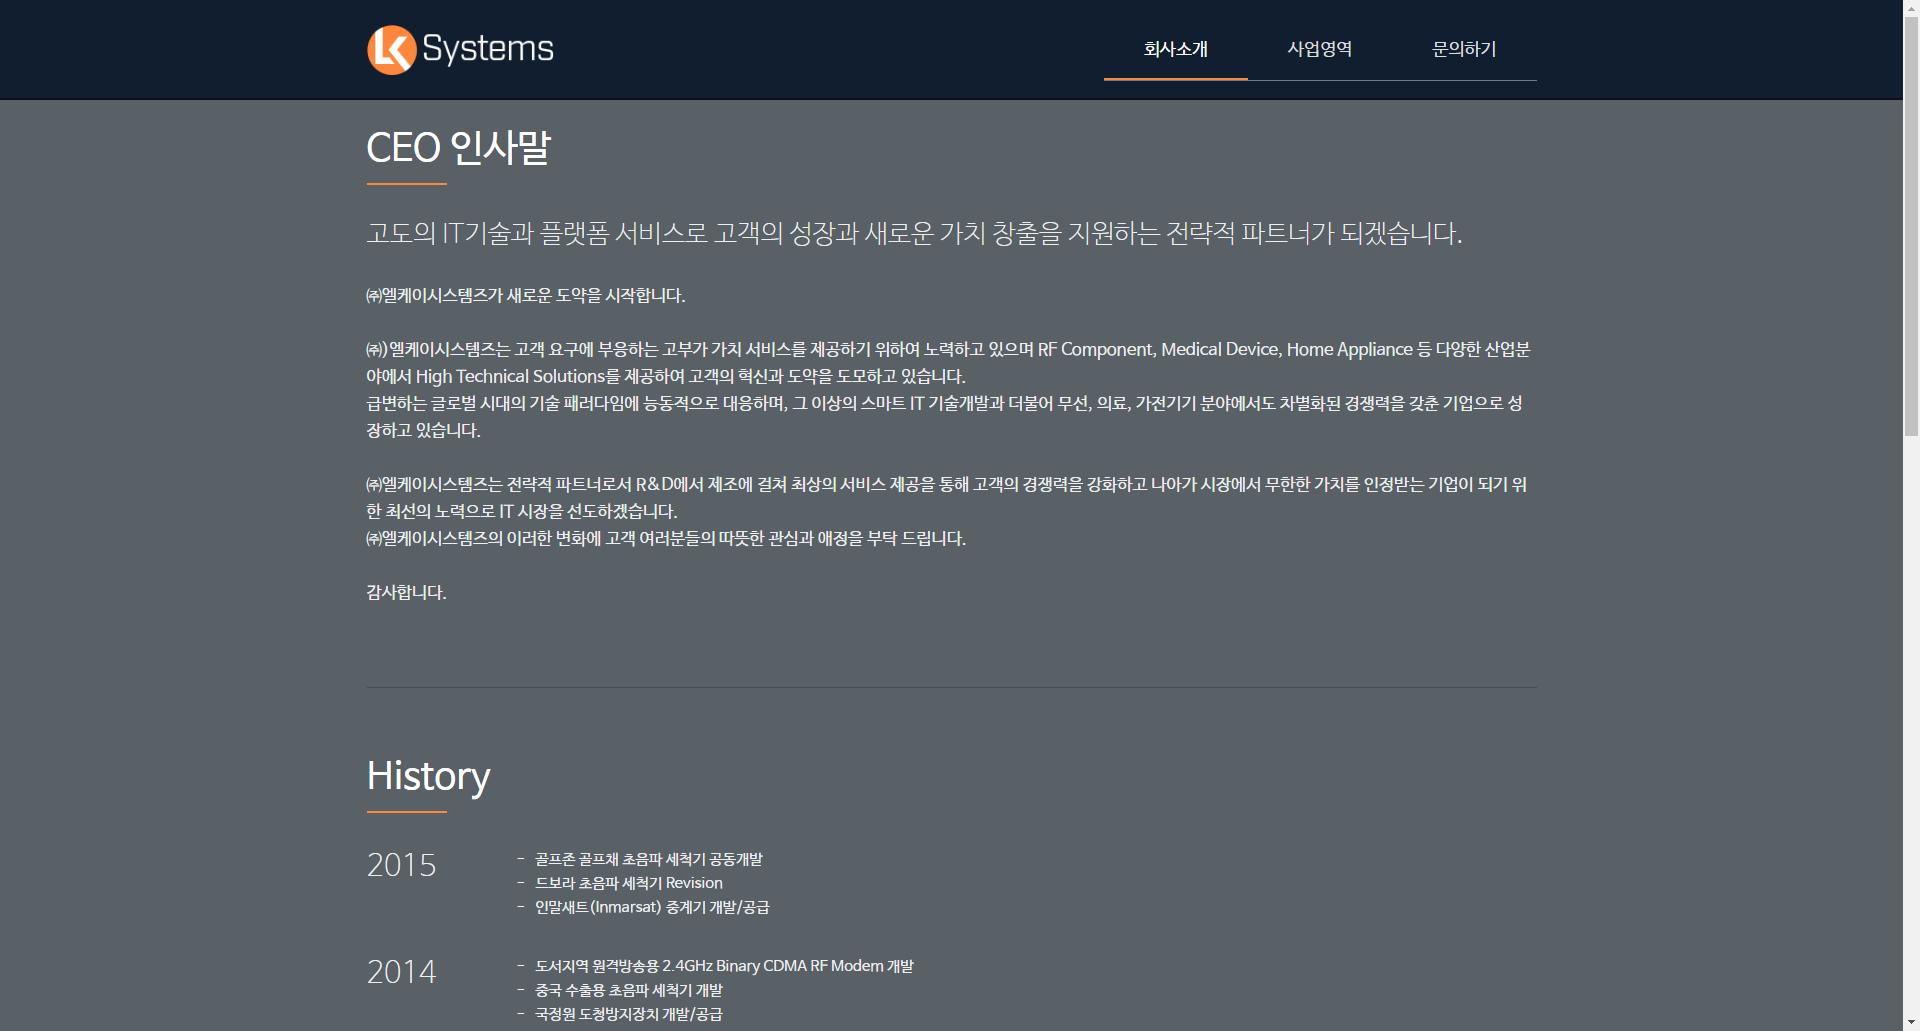 screencapture-lk-systems-1472634485219